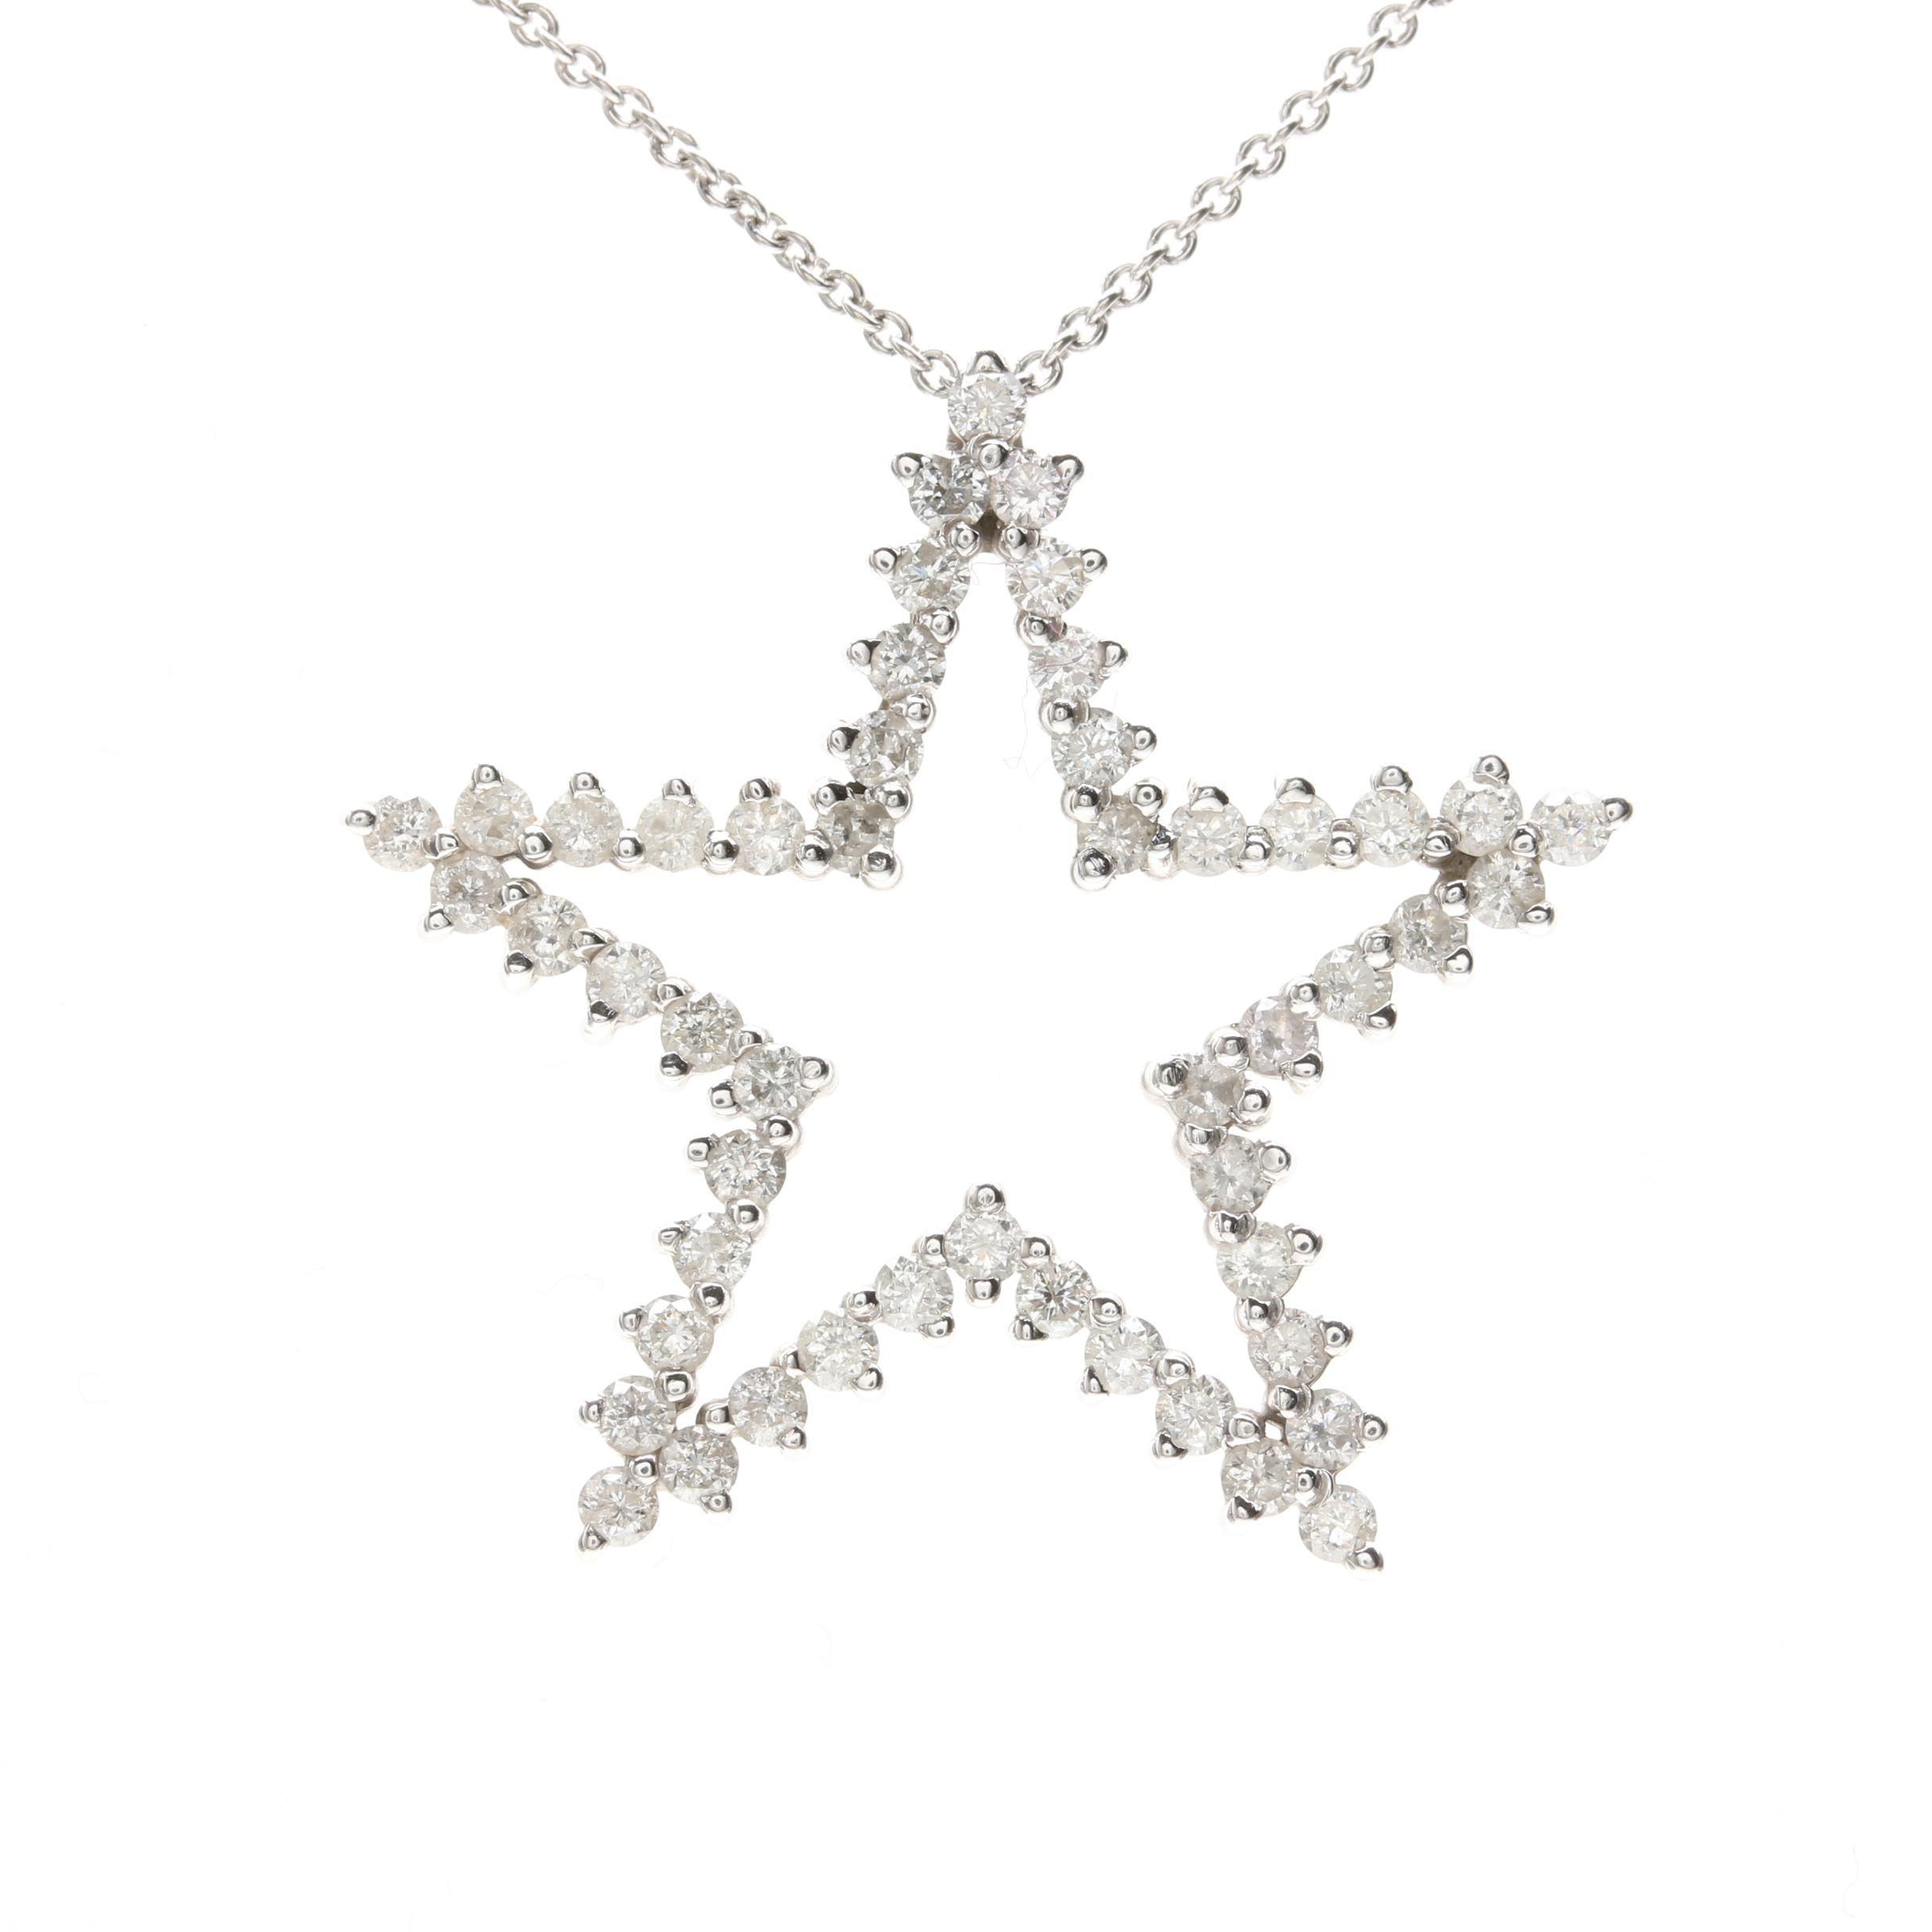 14K White Gold 1.25 CTW Diamond Star Pendant Necklace